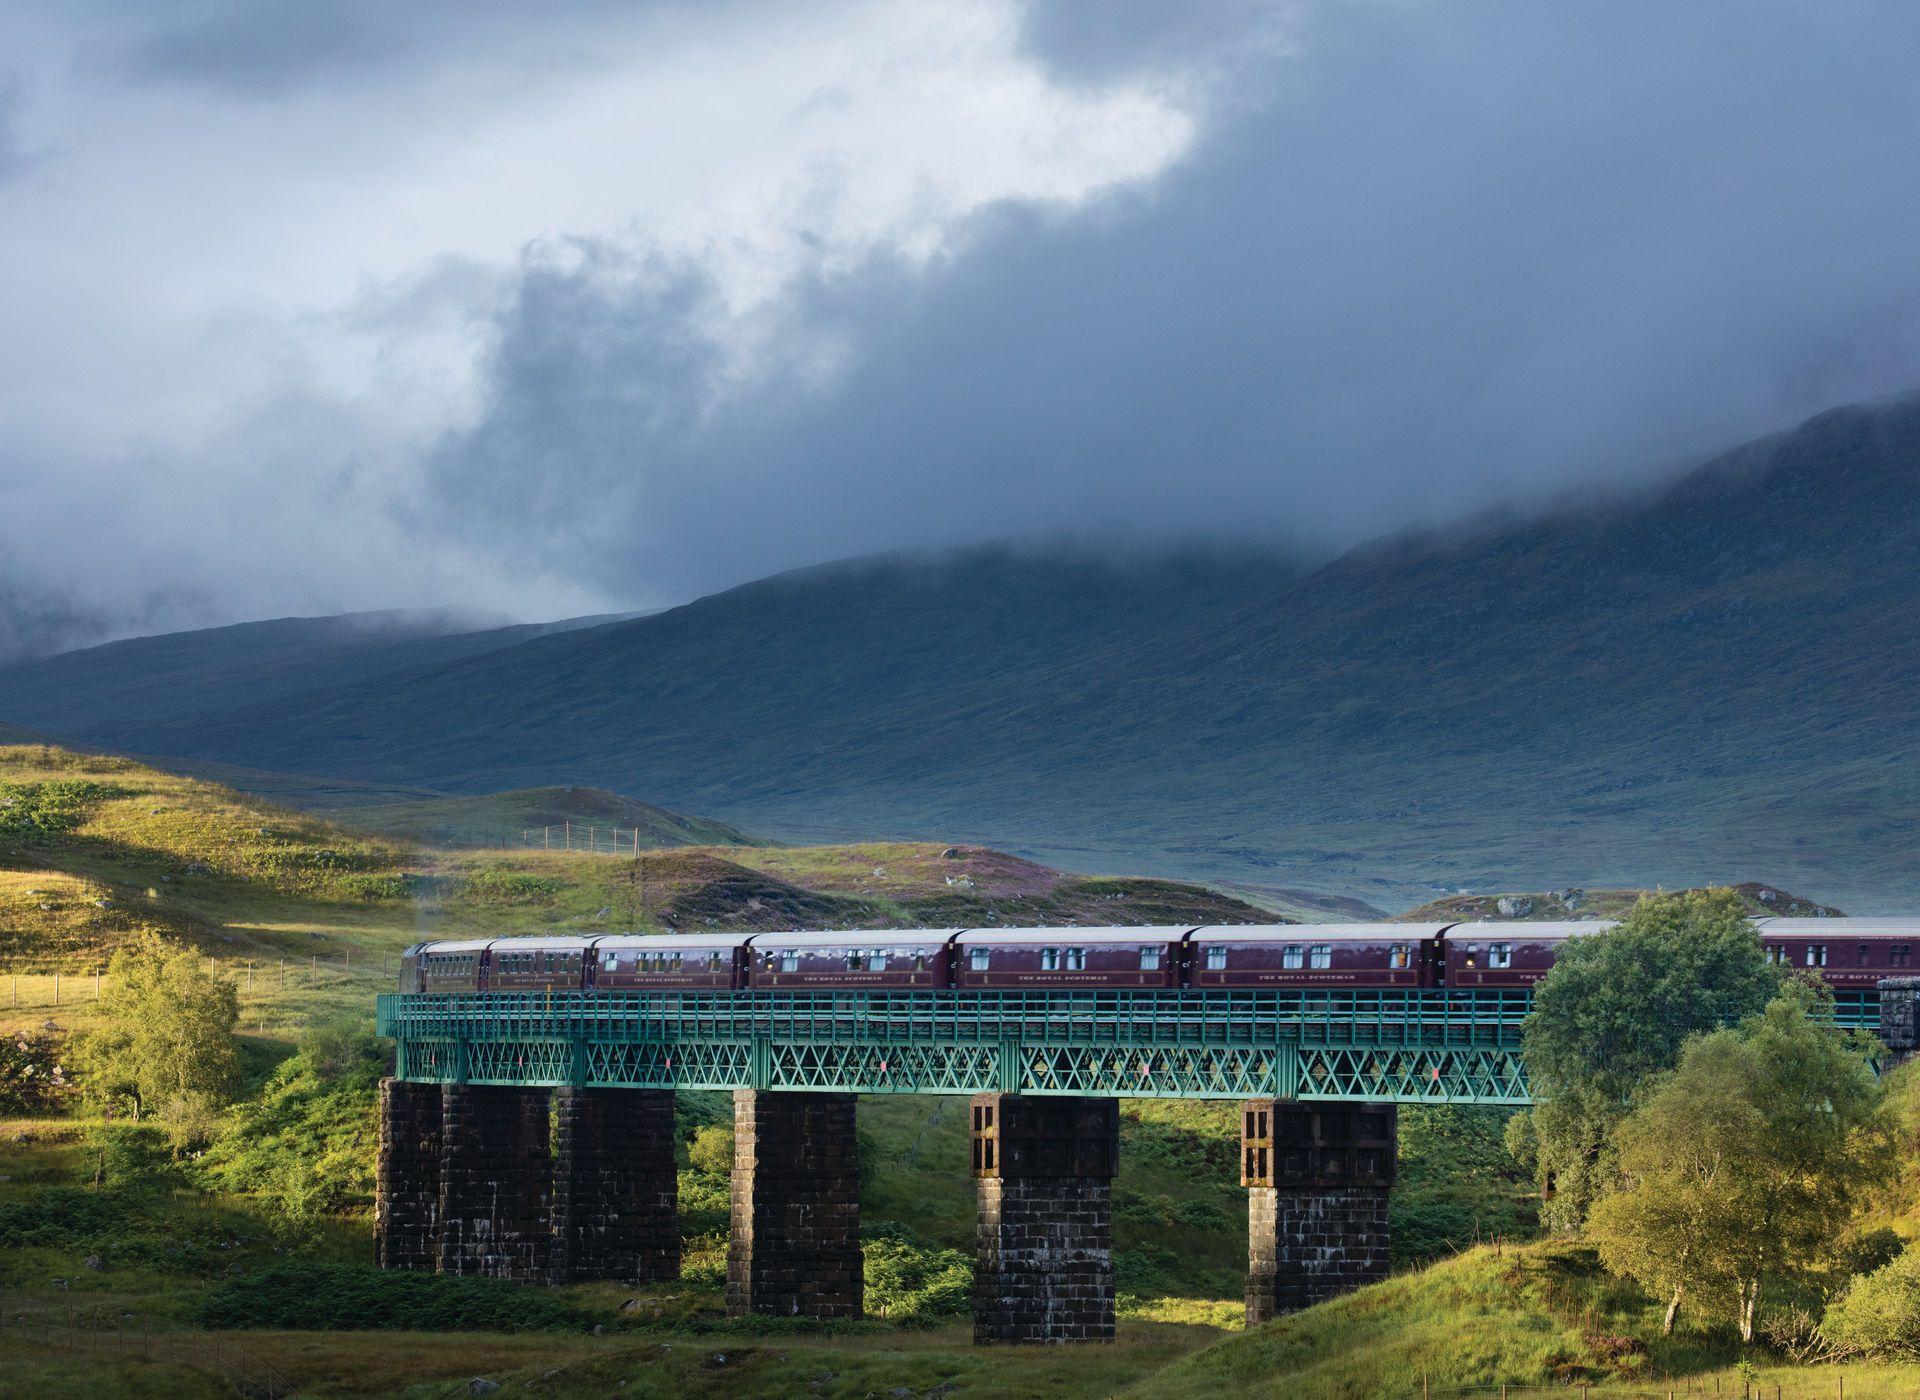 Edinburgh United Kingdom Grass Outdoor Train Sky Highland Track Mountainous Landforms Mountain Transport Atmospheric